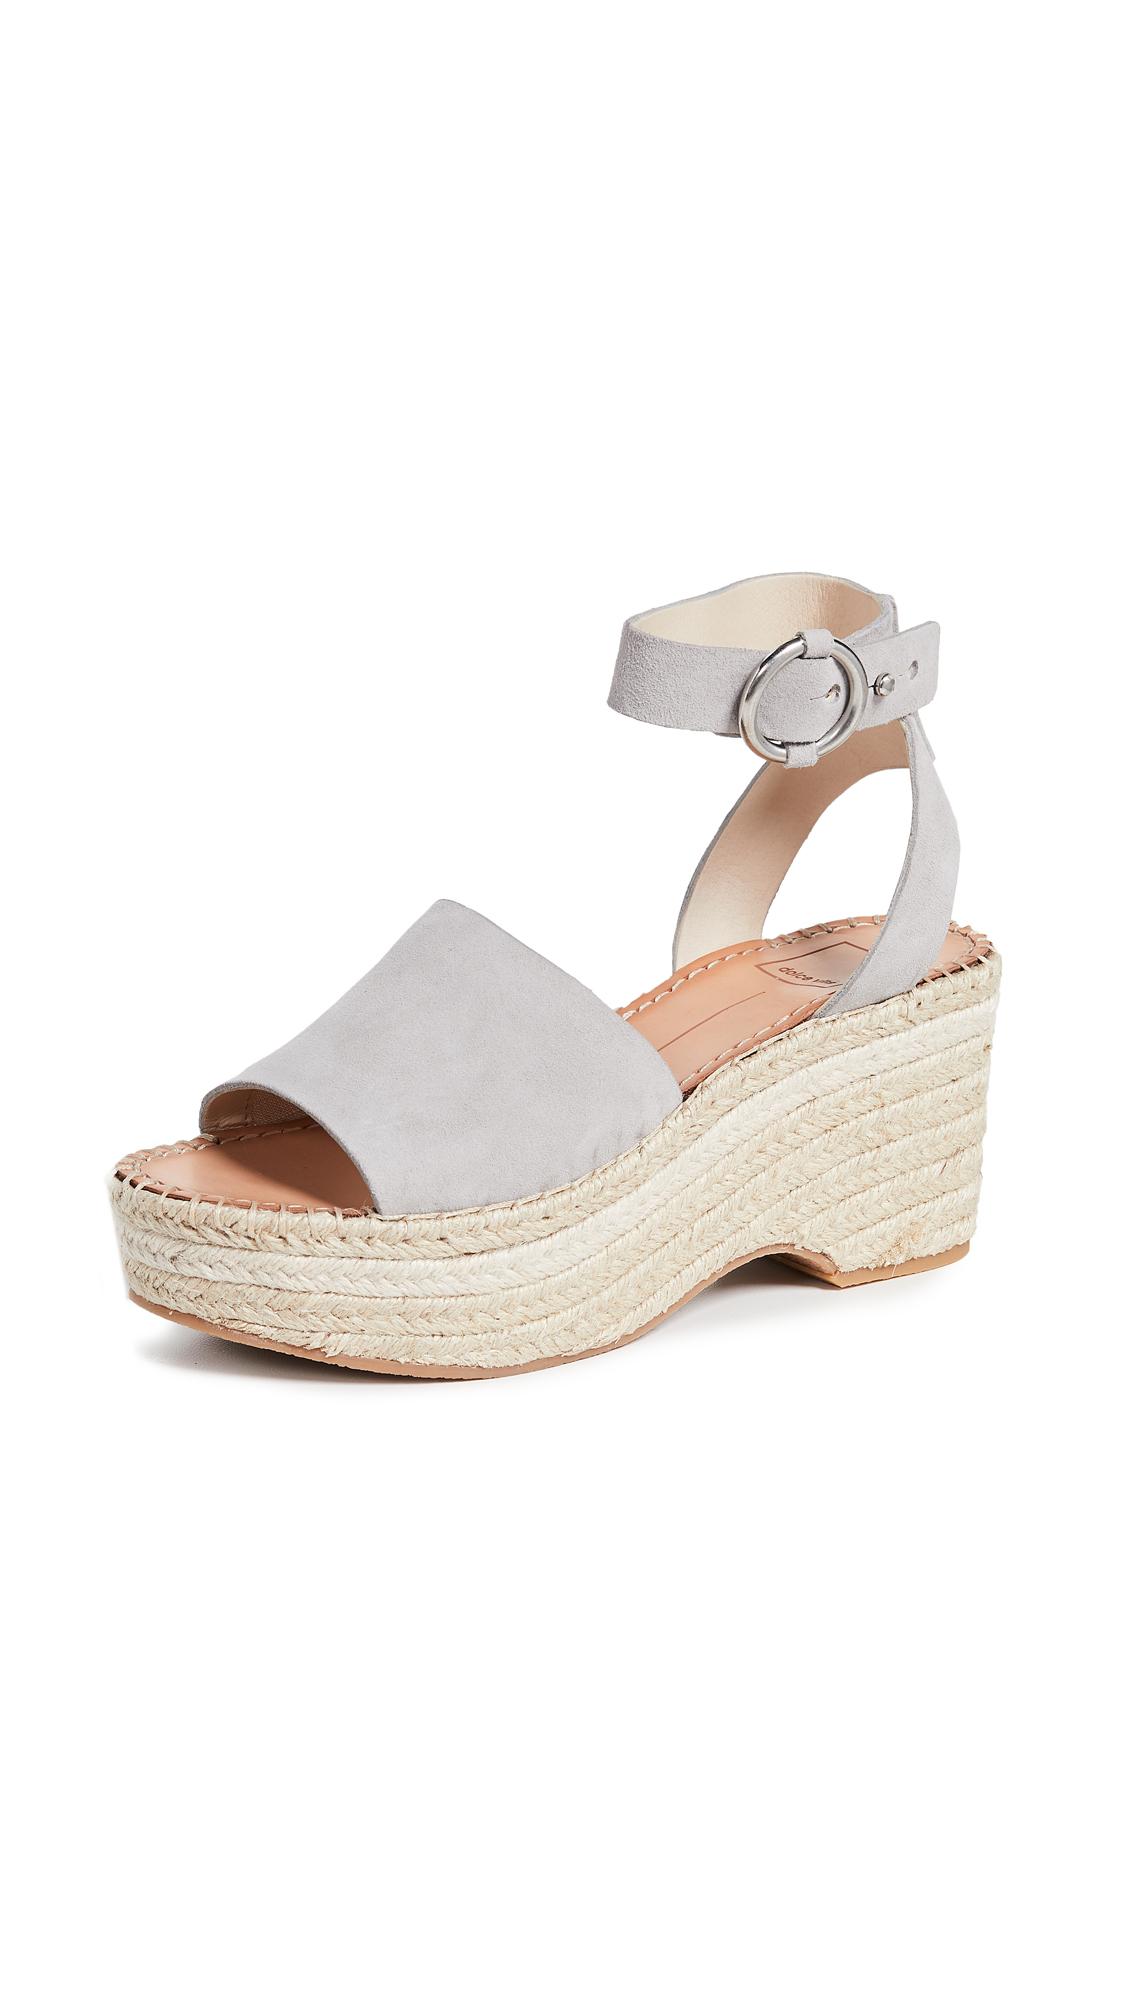 Dolce Vita Lesly Ankle Strap Espadrilles - Grey